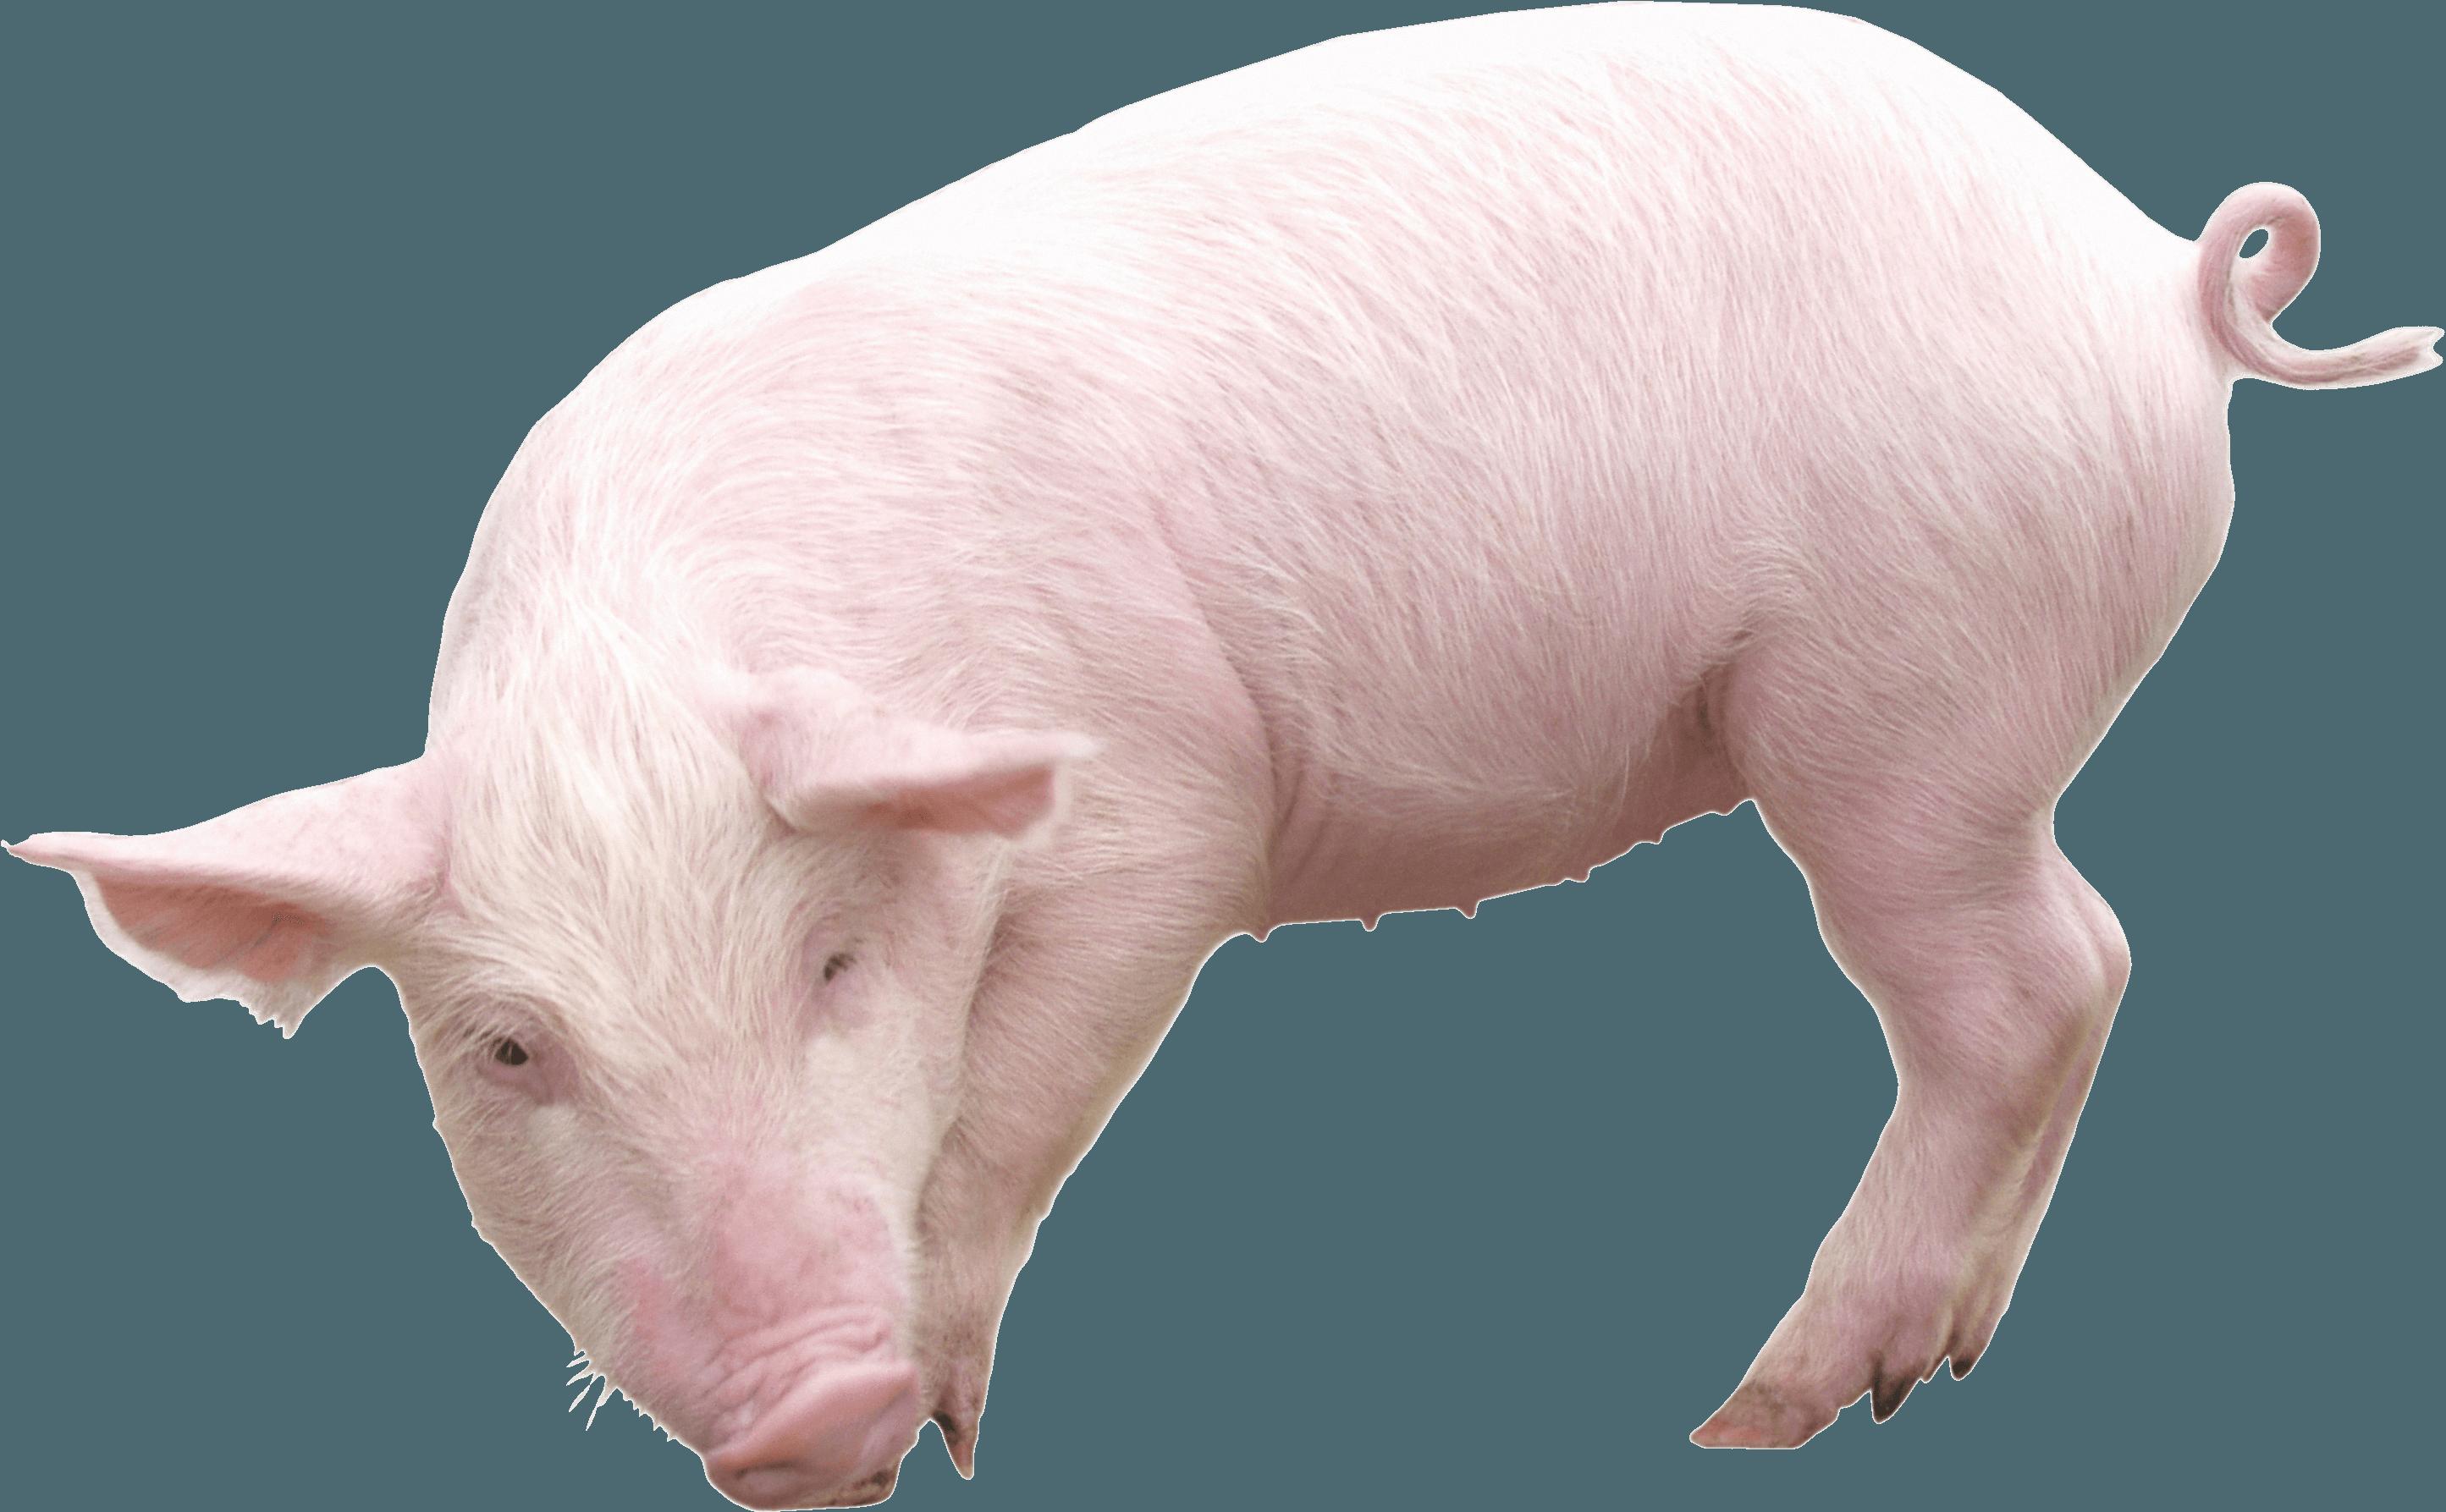 Pig PNG Transparent image - Pig PNG